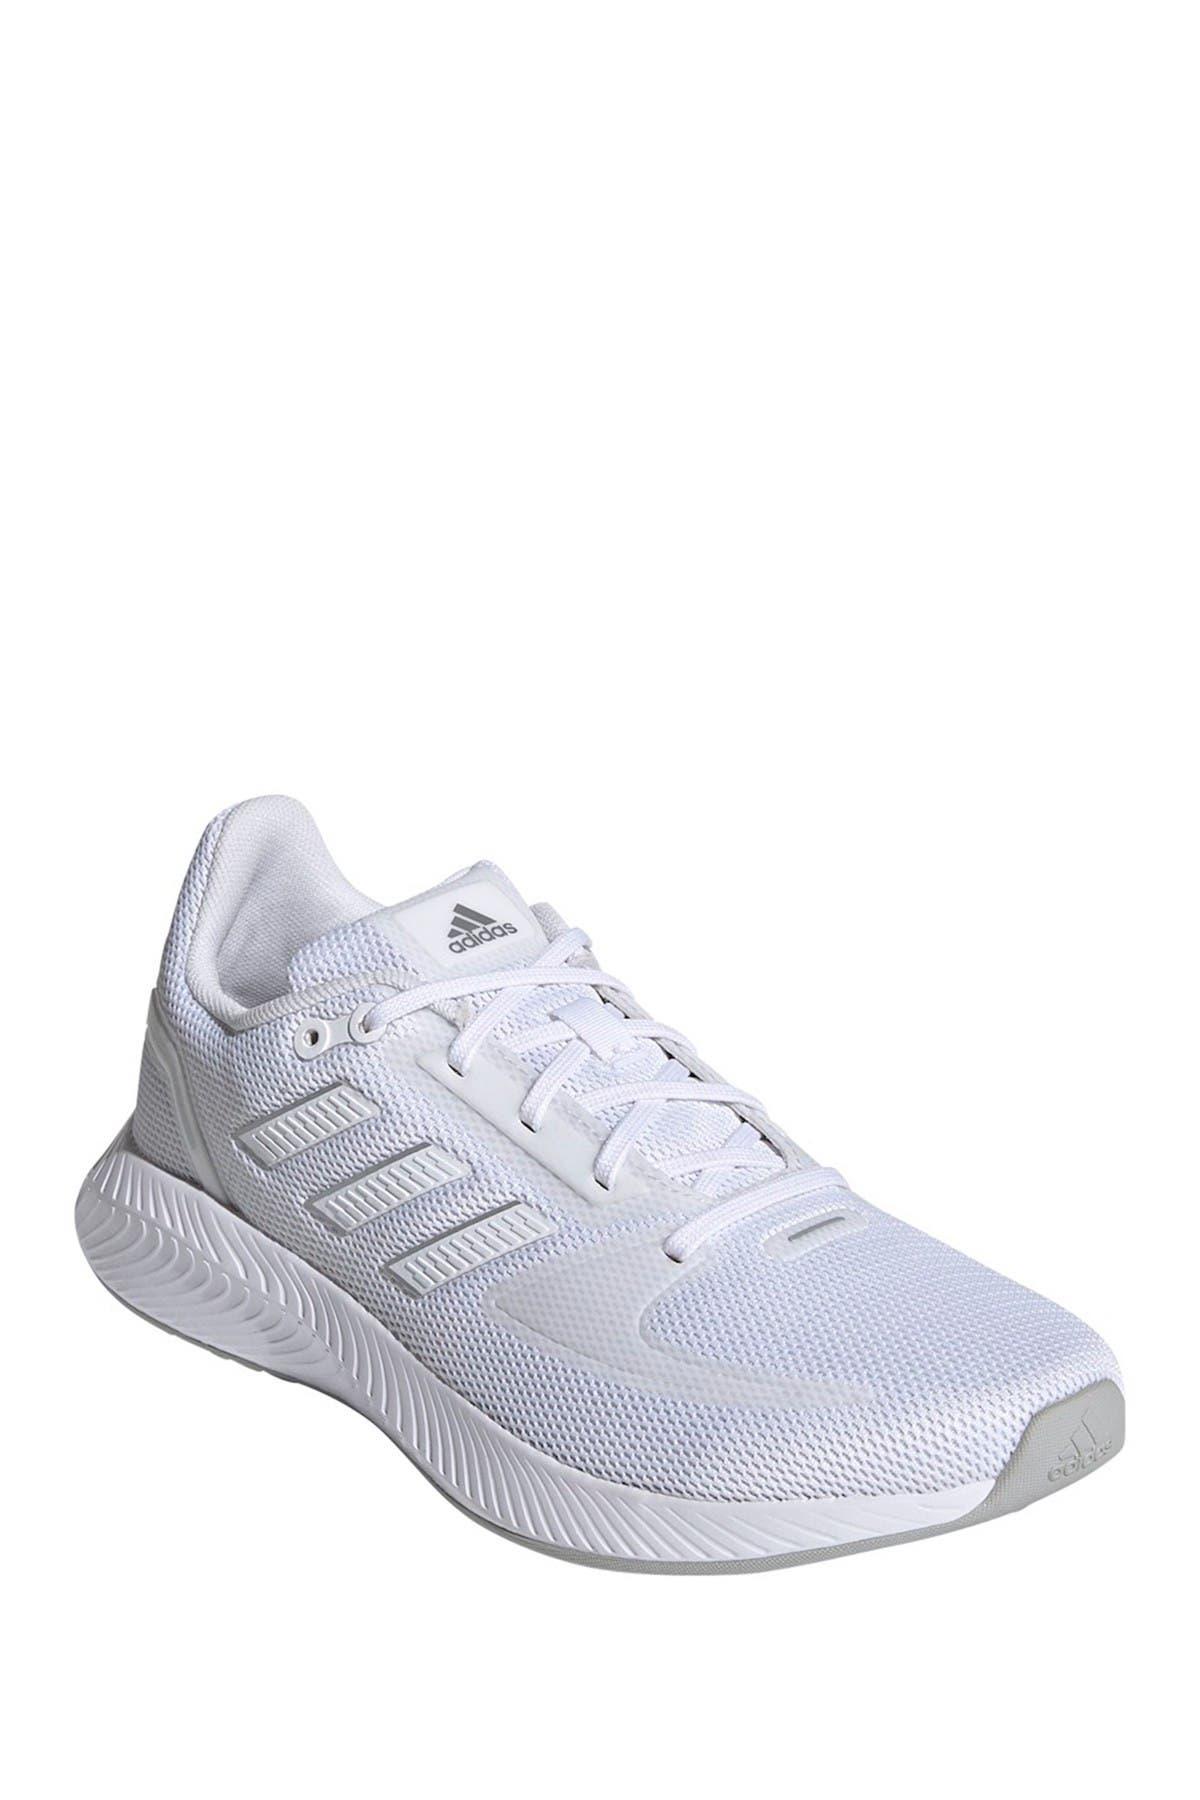 Image of adidas Runfalcon 2.0 Sneaker